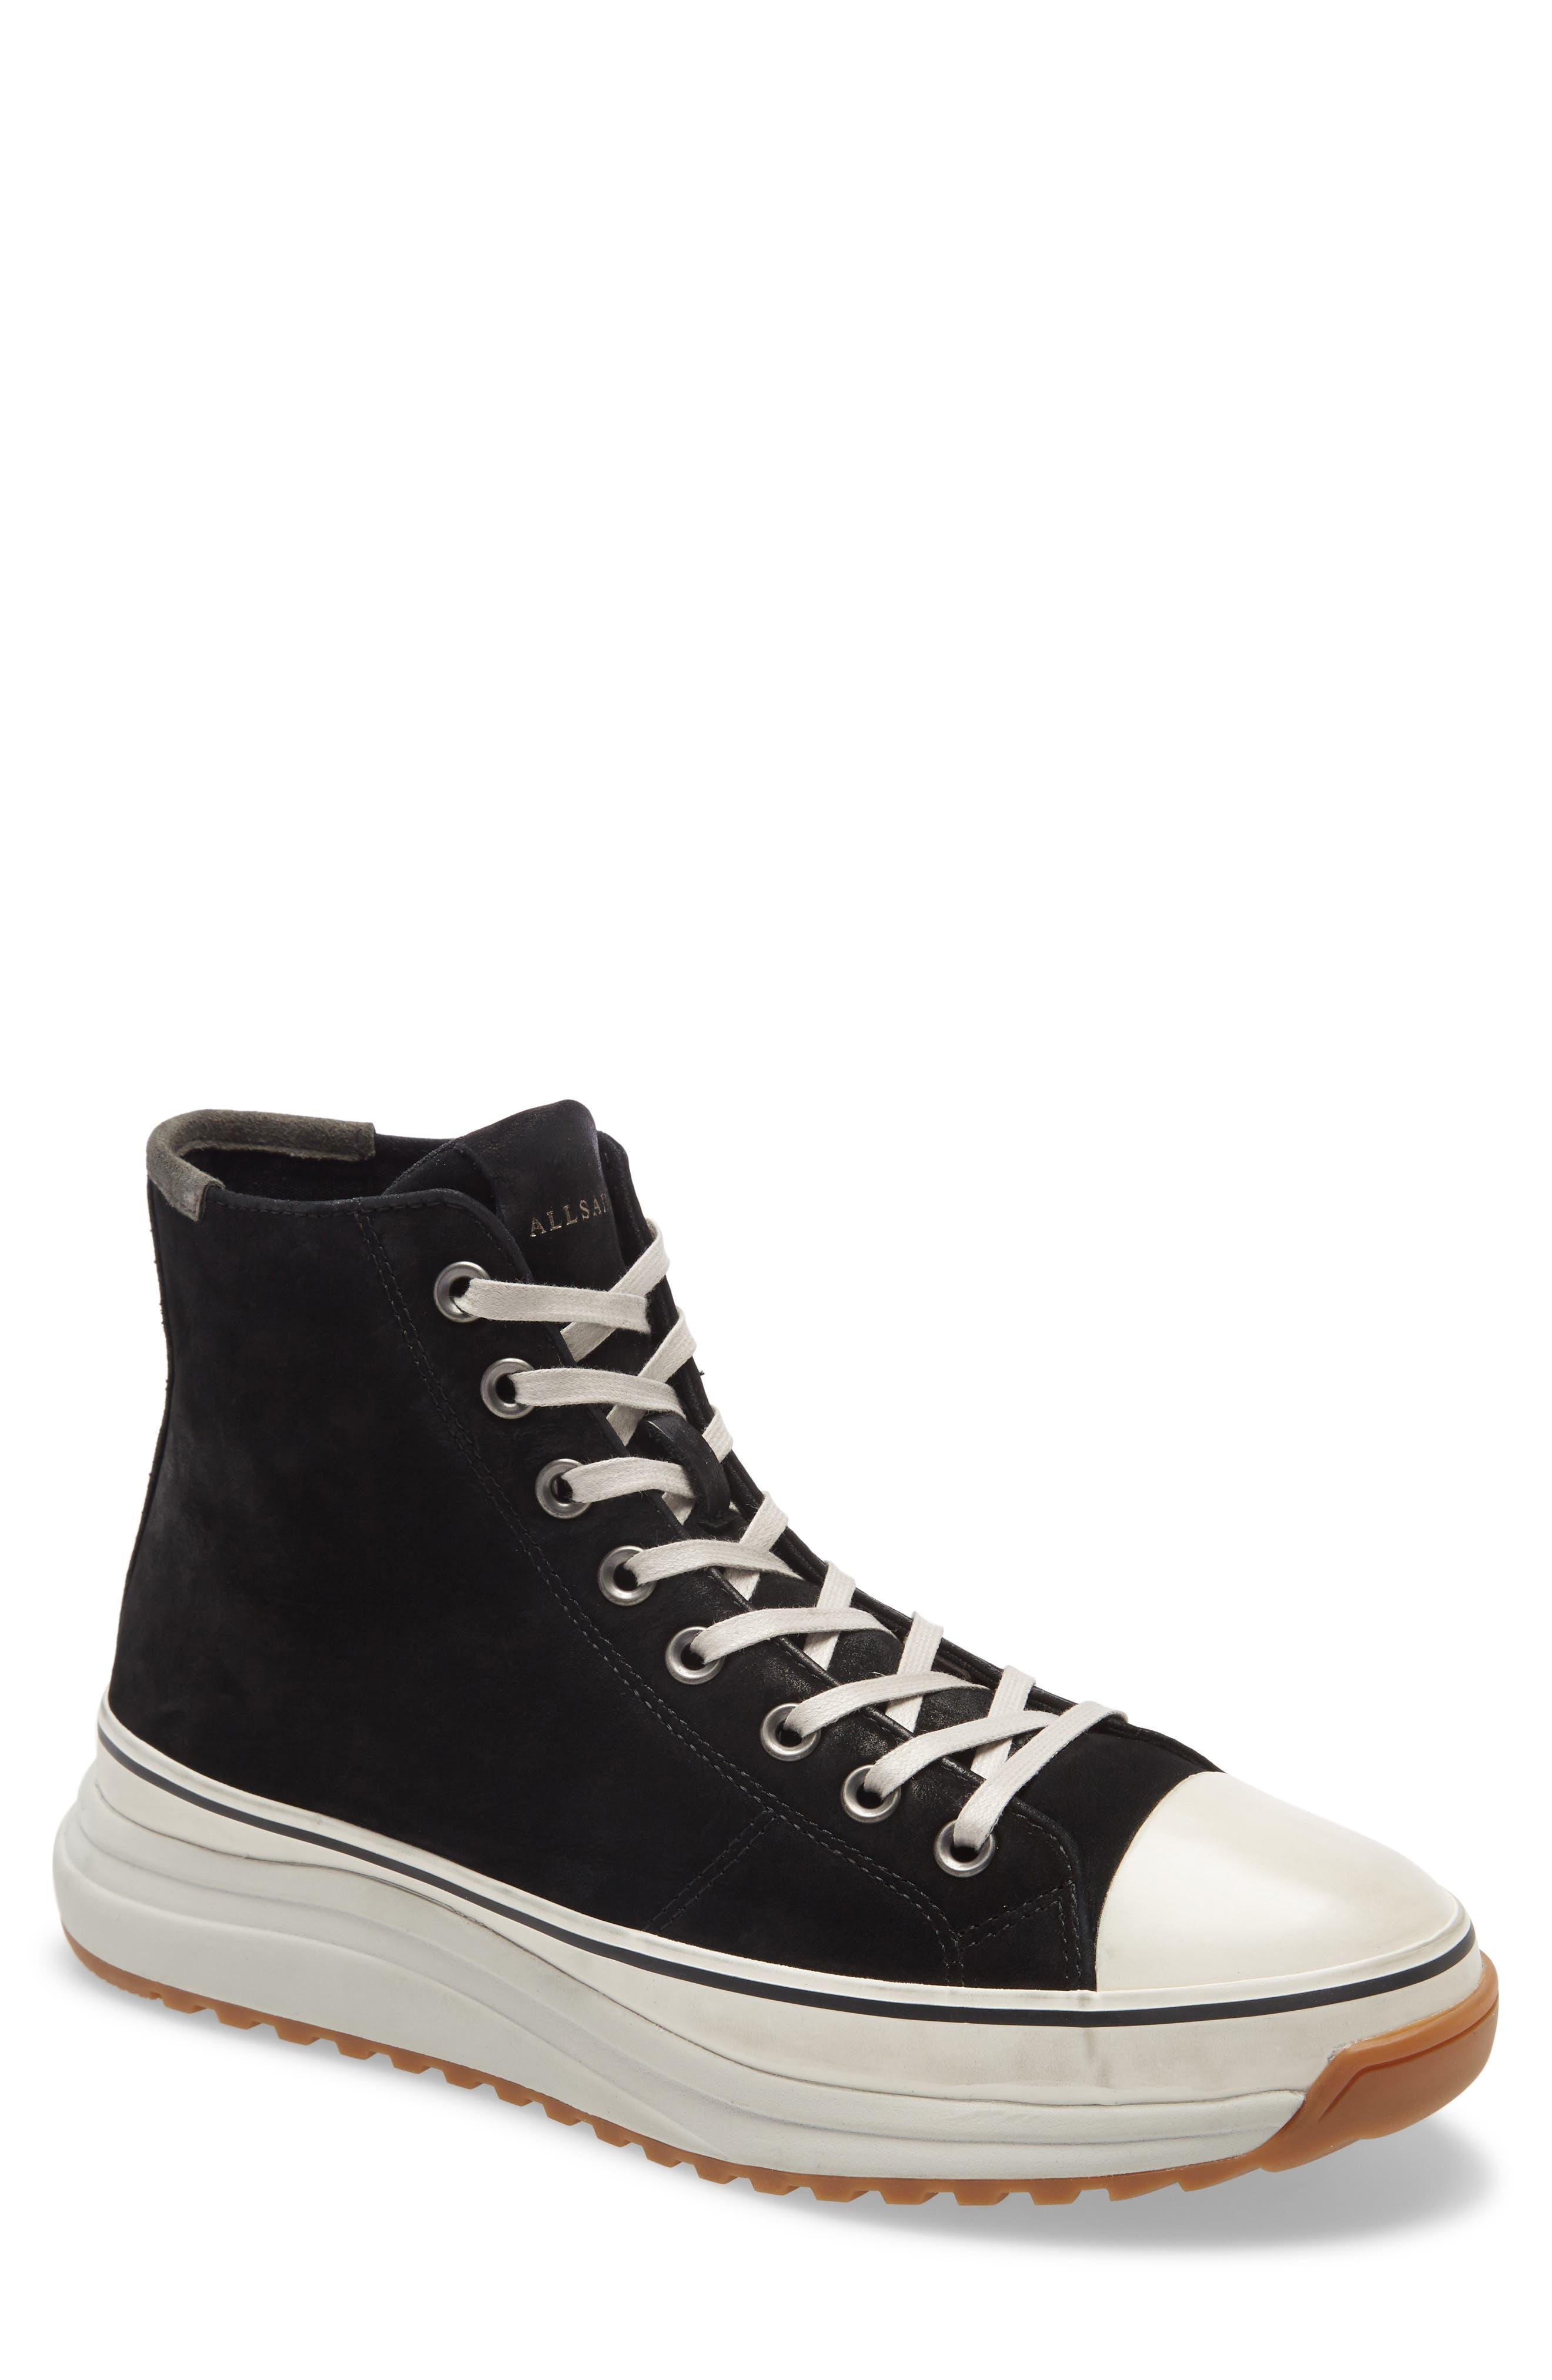 Image of ALLSAINTS Blakley High Top Sneaker